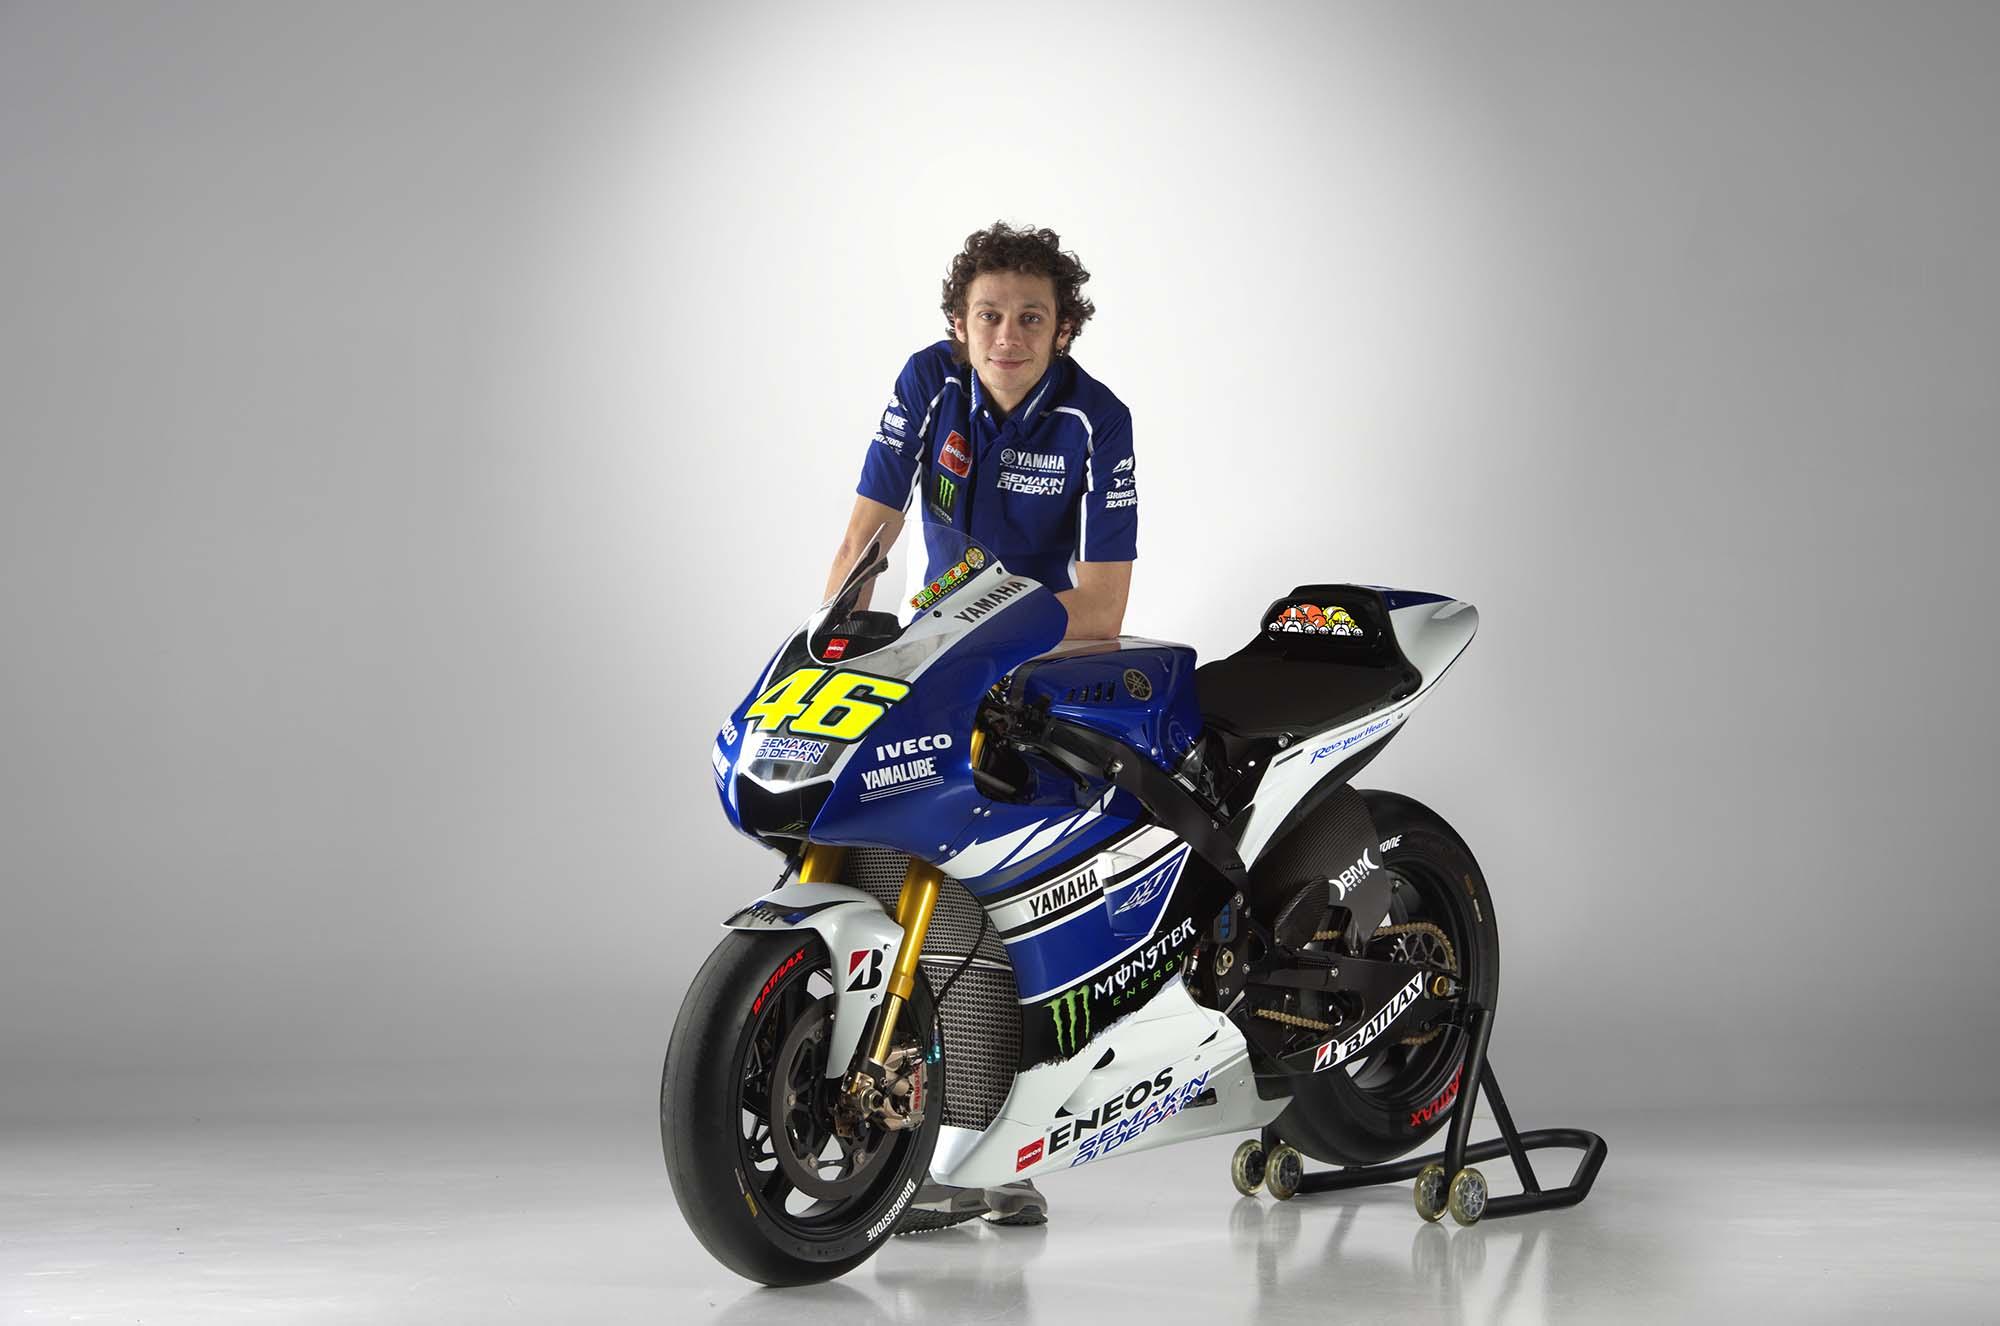 Rossi, Lorenzo, and the 2013 Yamaha YZR-M1 - Asphalt & Rubber